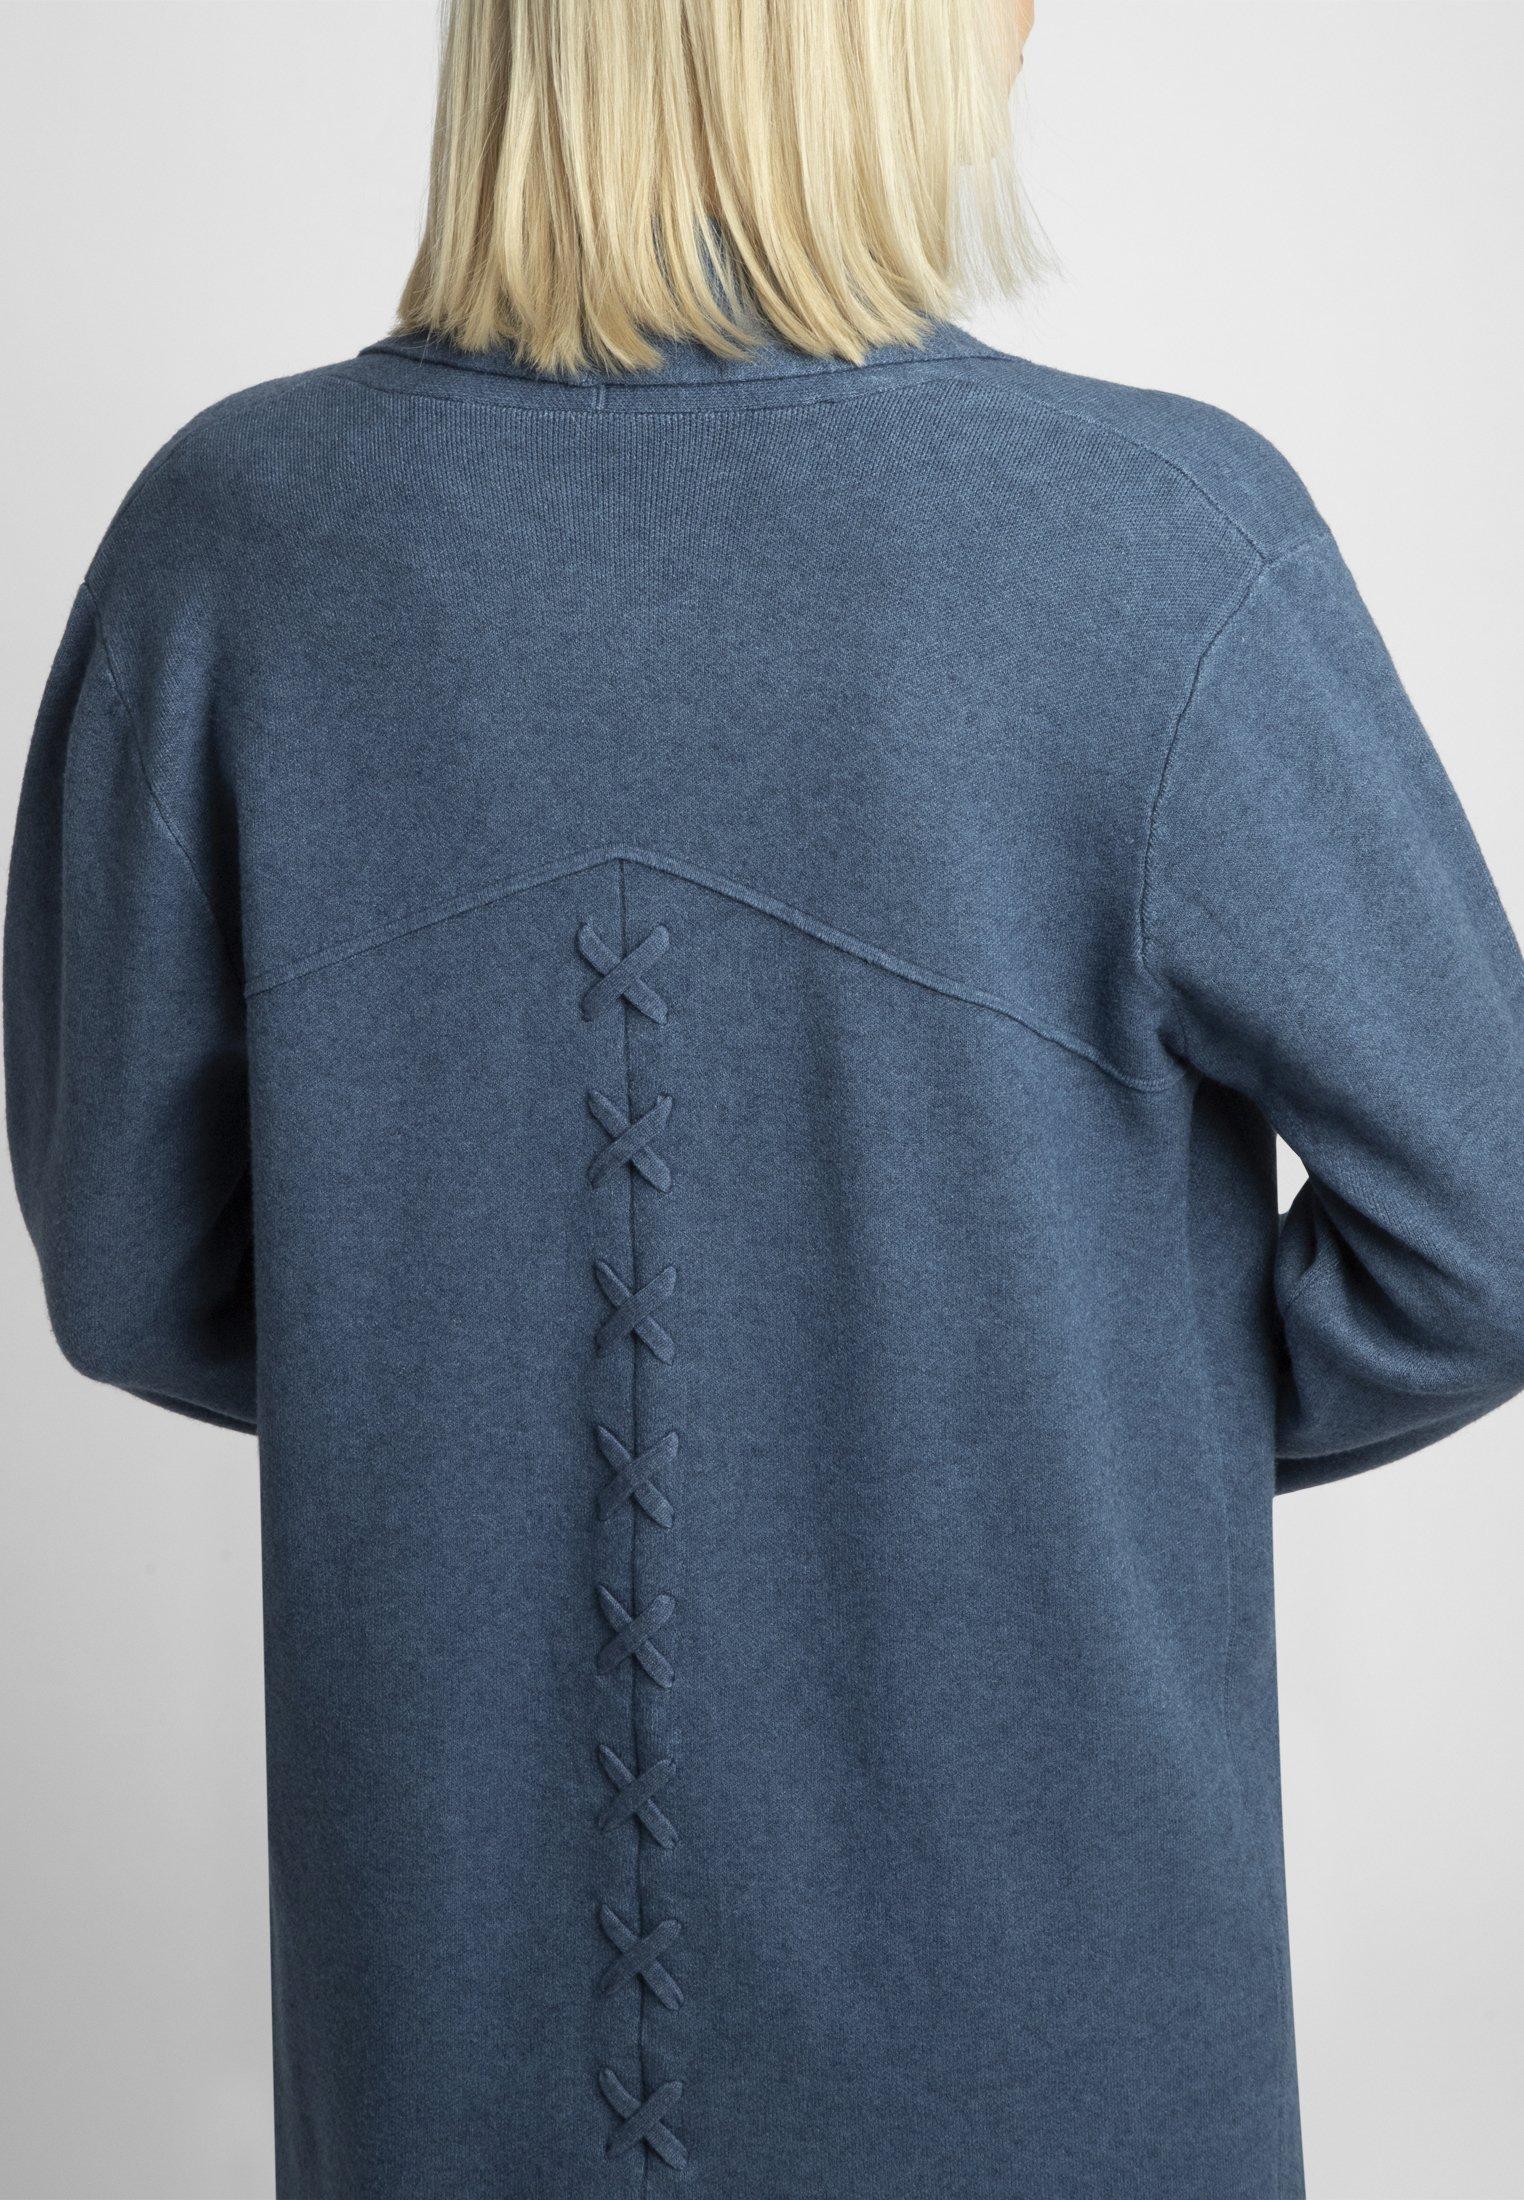 Apart Cardigan - Jeans Blue